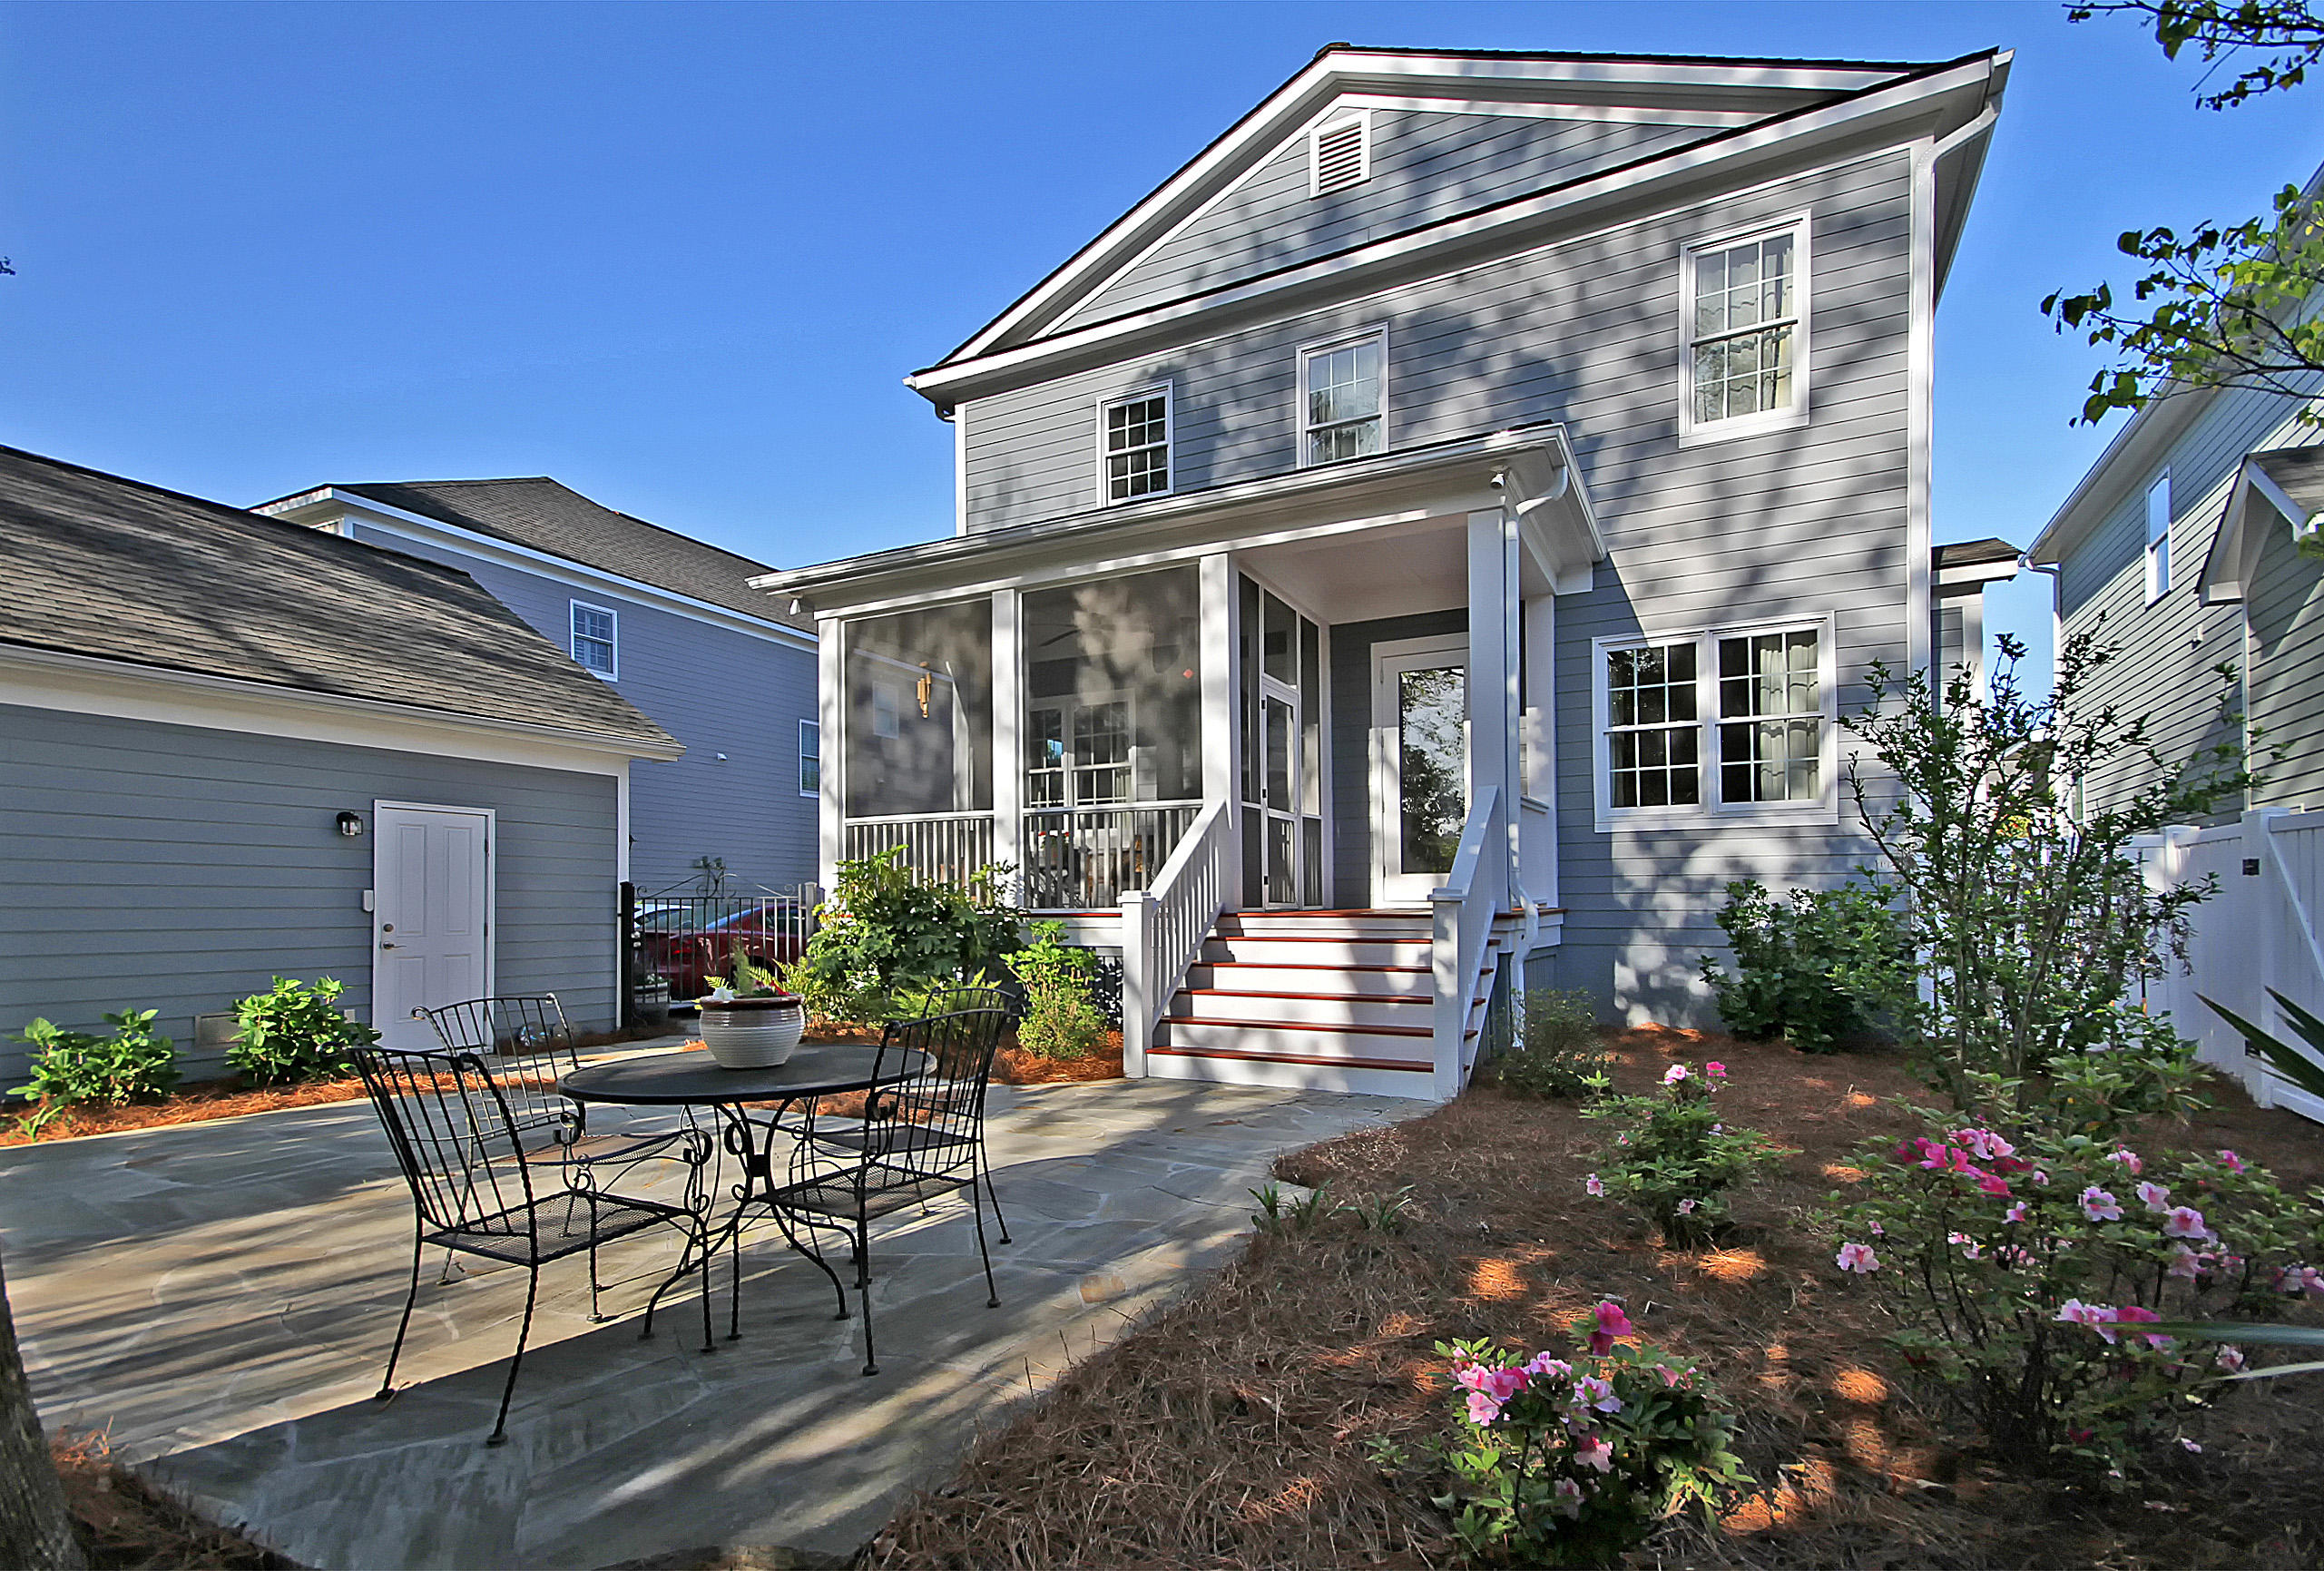 Cloudbreak Court Homes For Sale - 638 Cloudbreak, Charleston, SC - 34